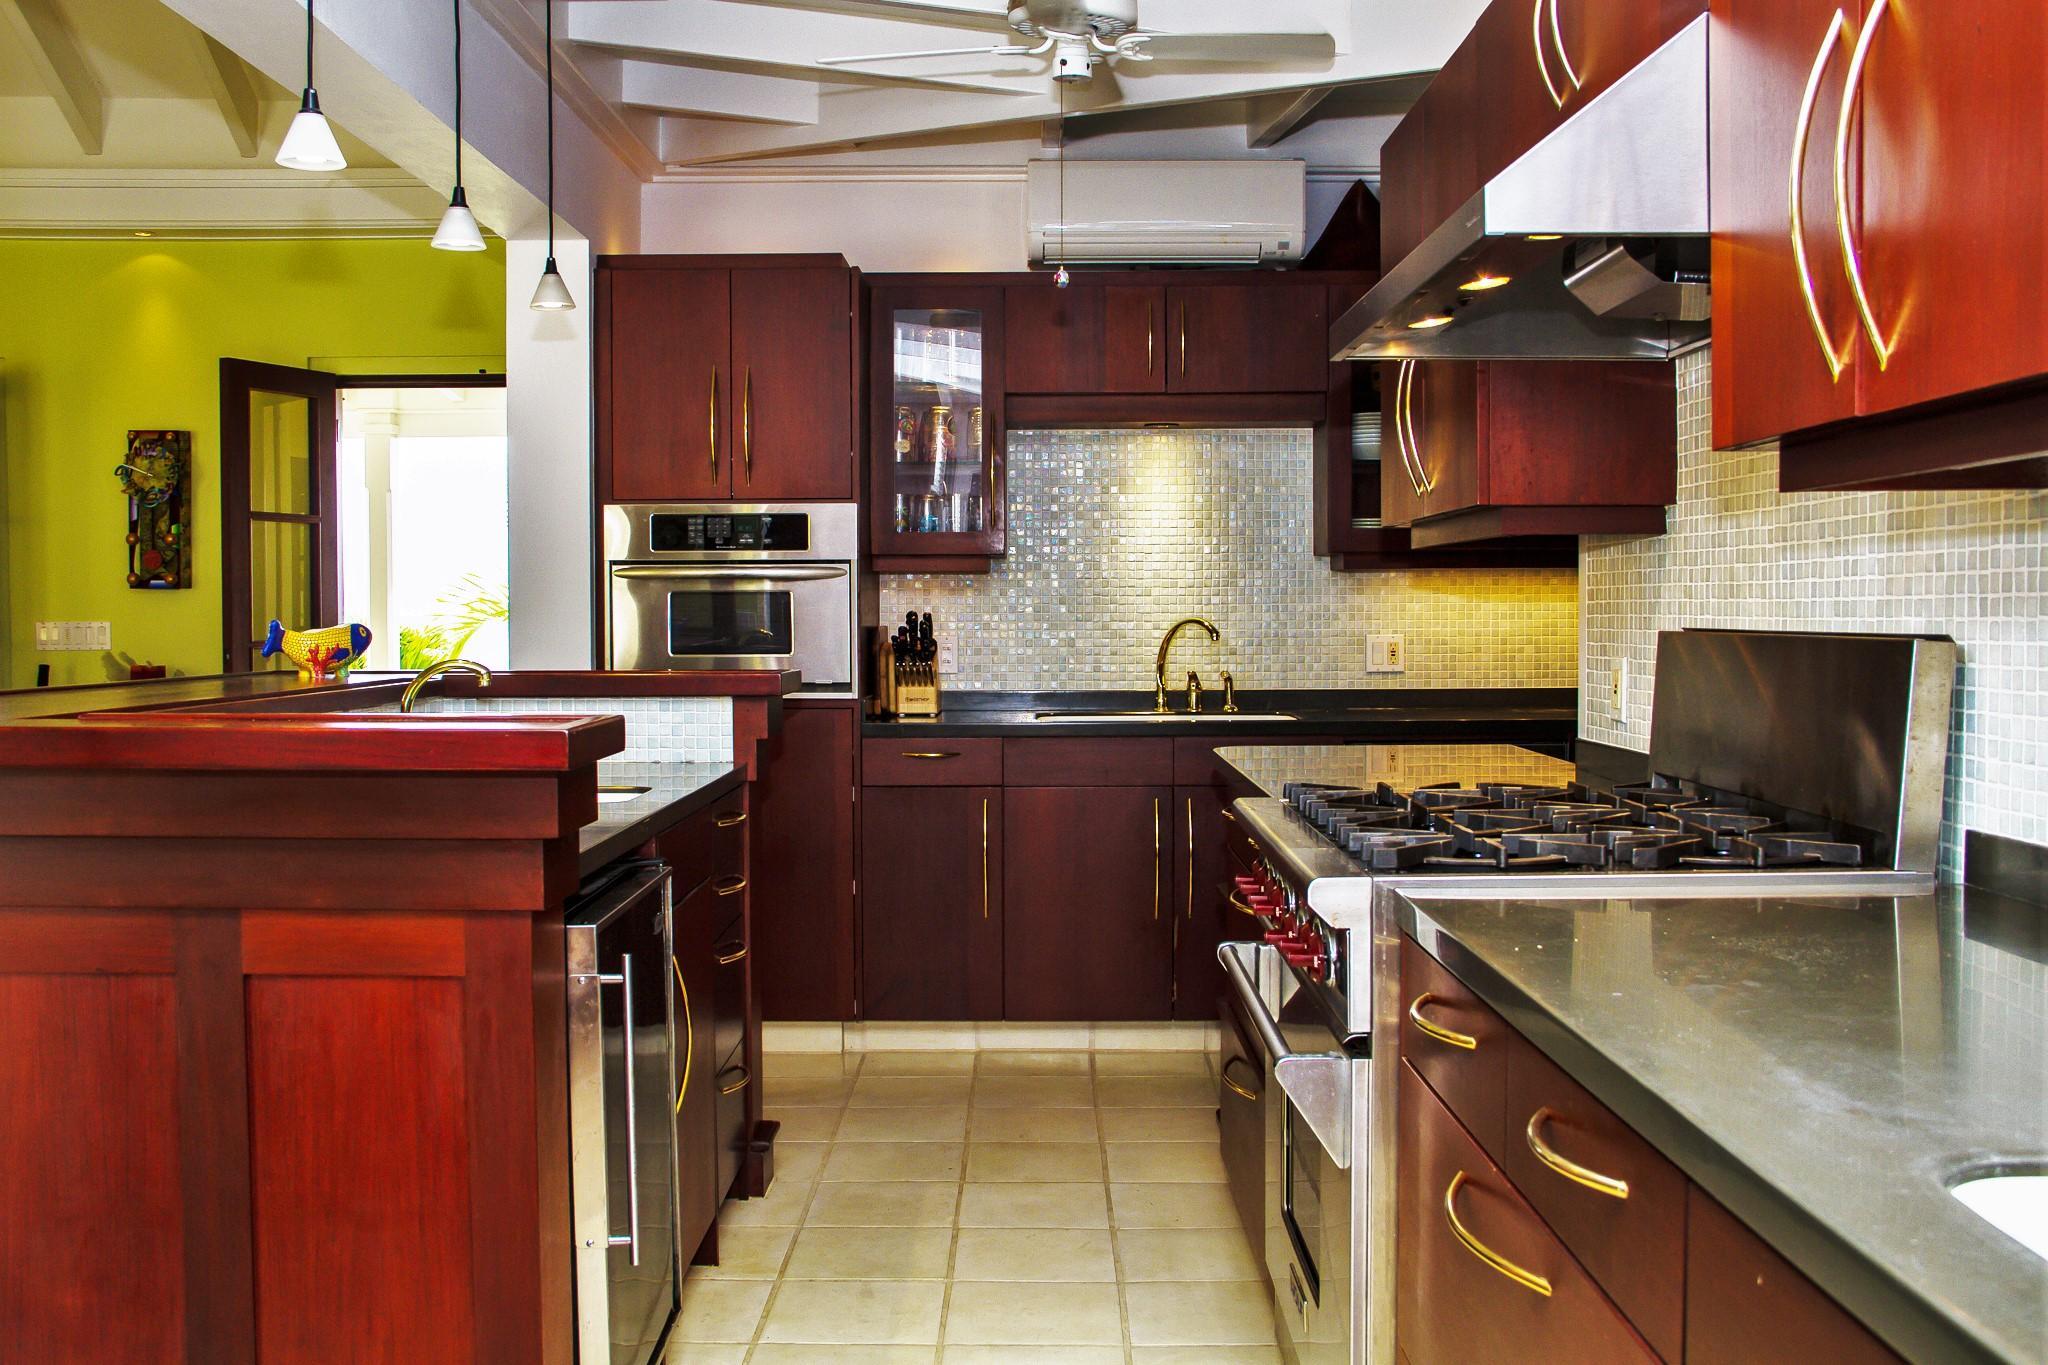 Chef's Range with Custom Tile Backsplash